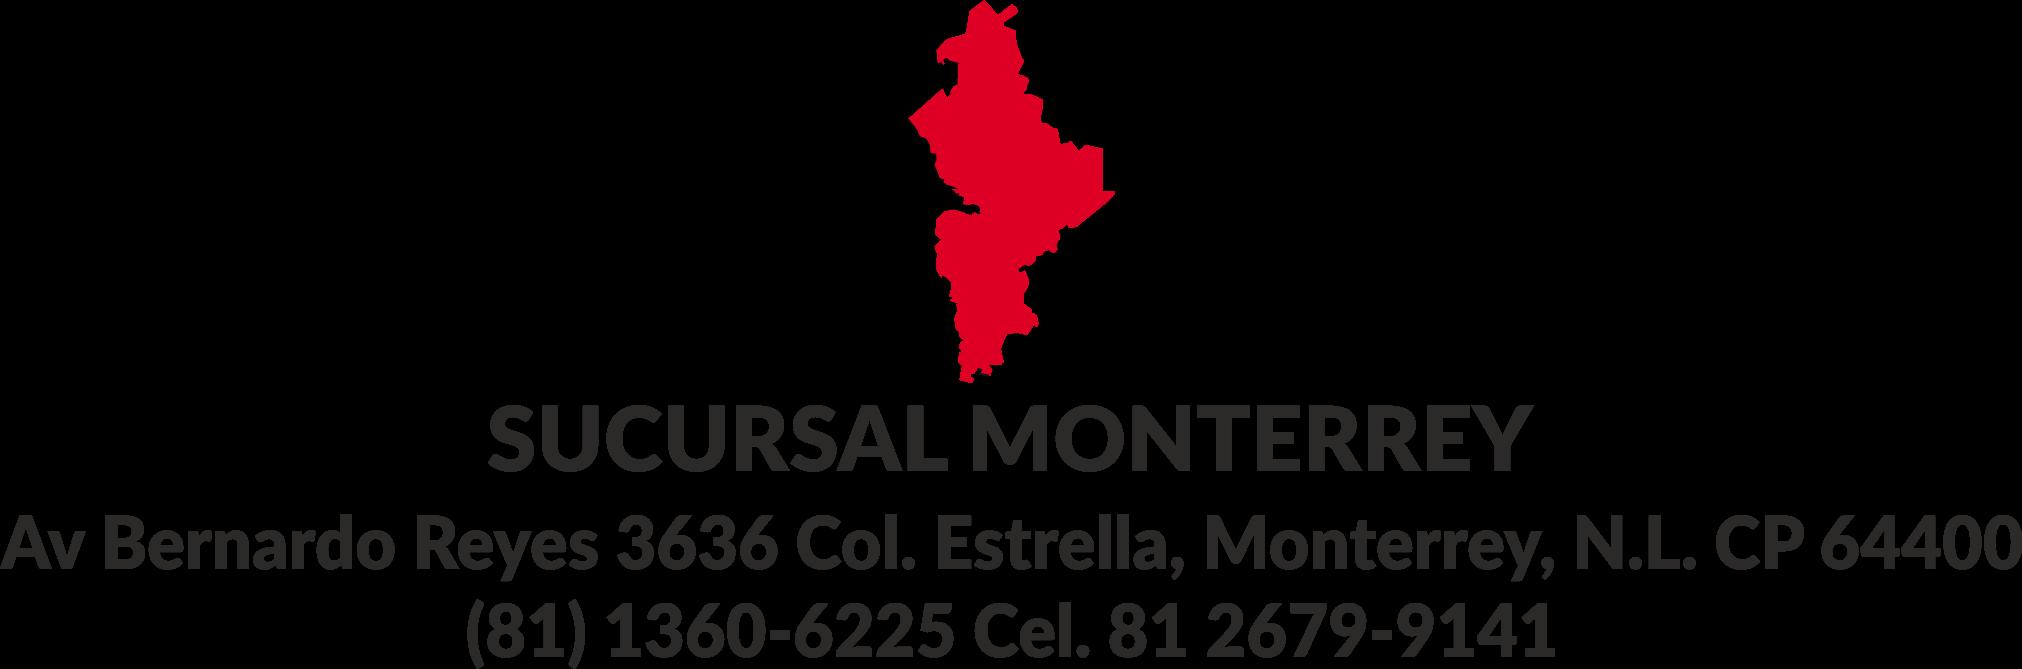 https://0201.nccdn.net/1_2/000/000/167/148/Direccion-Monterrey-2022x669.png